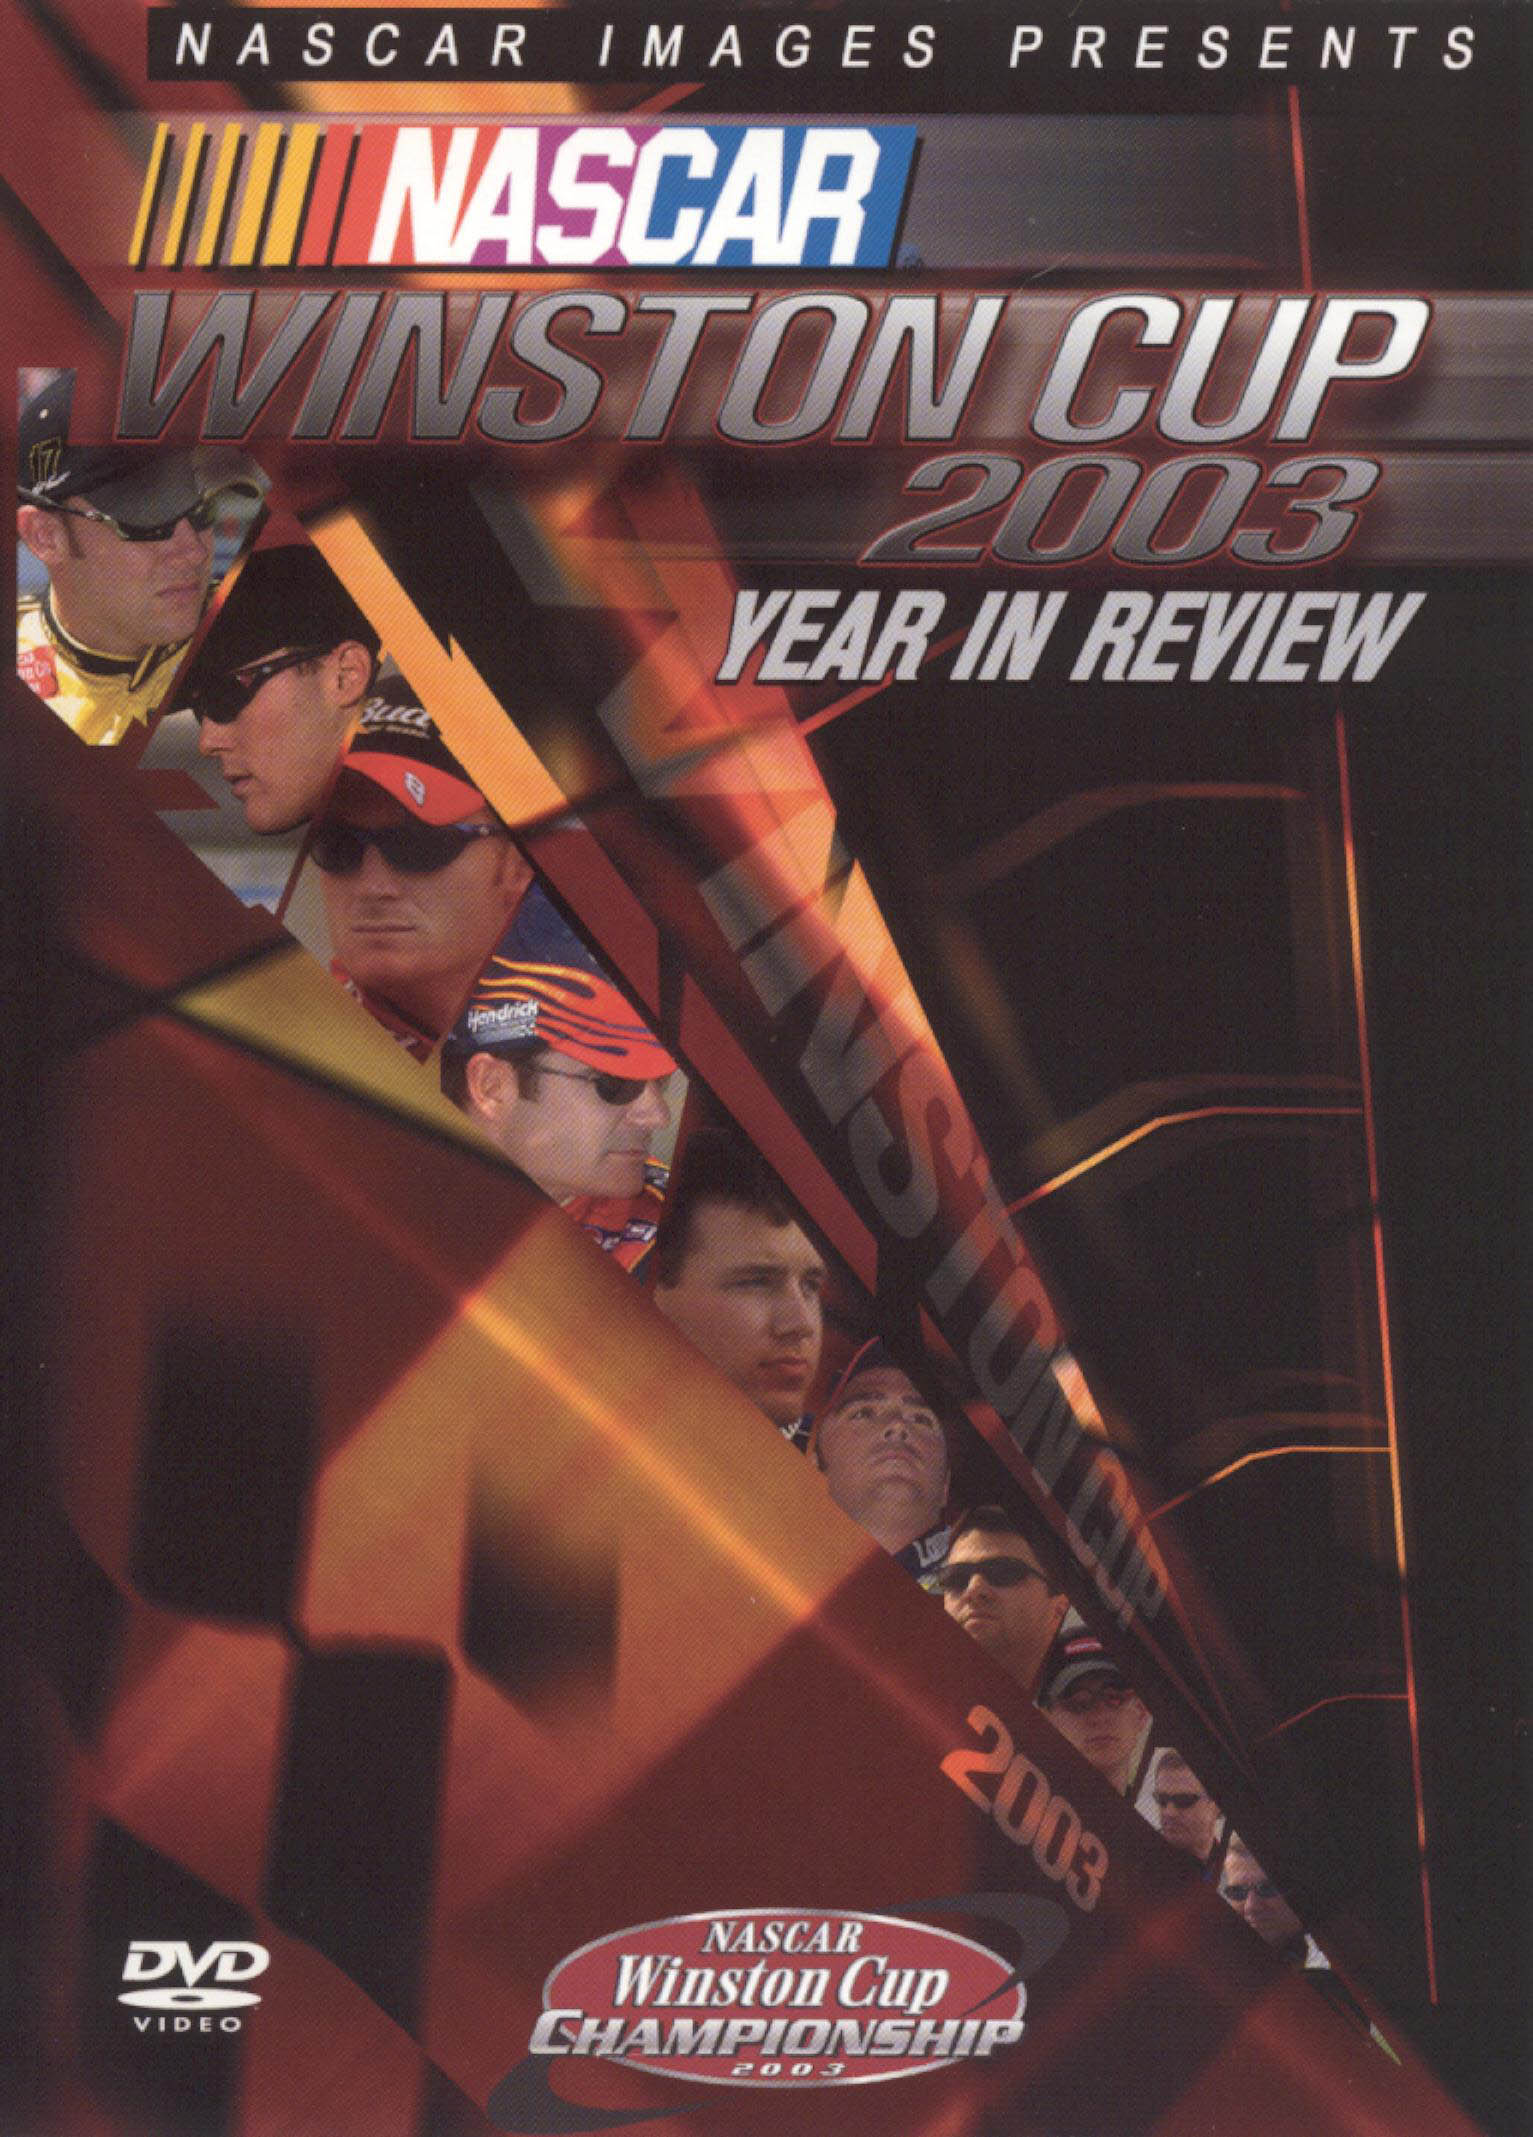 NASCAR: Winston Cup 2003